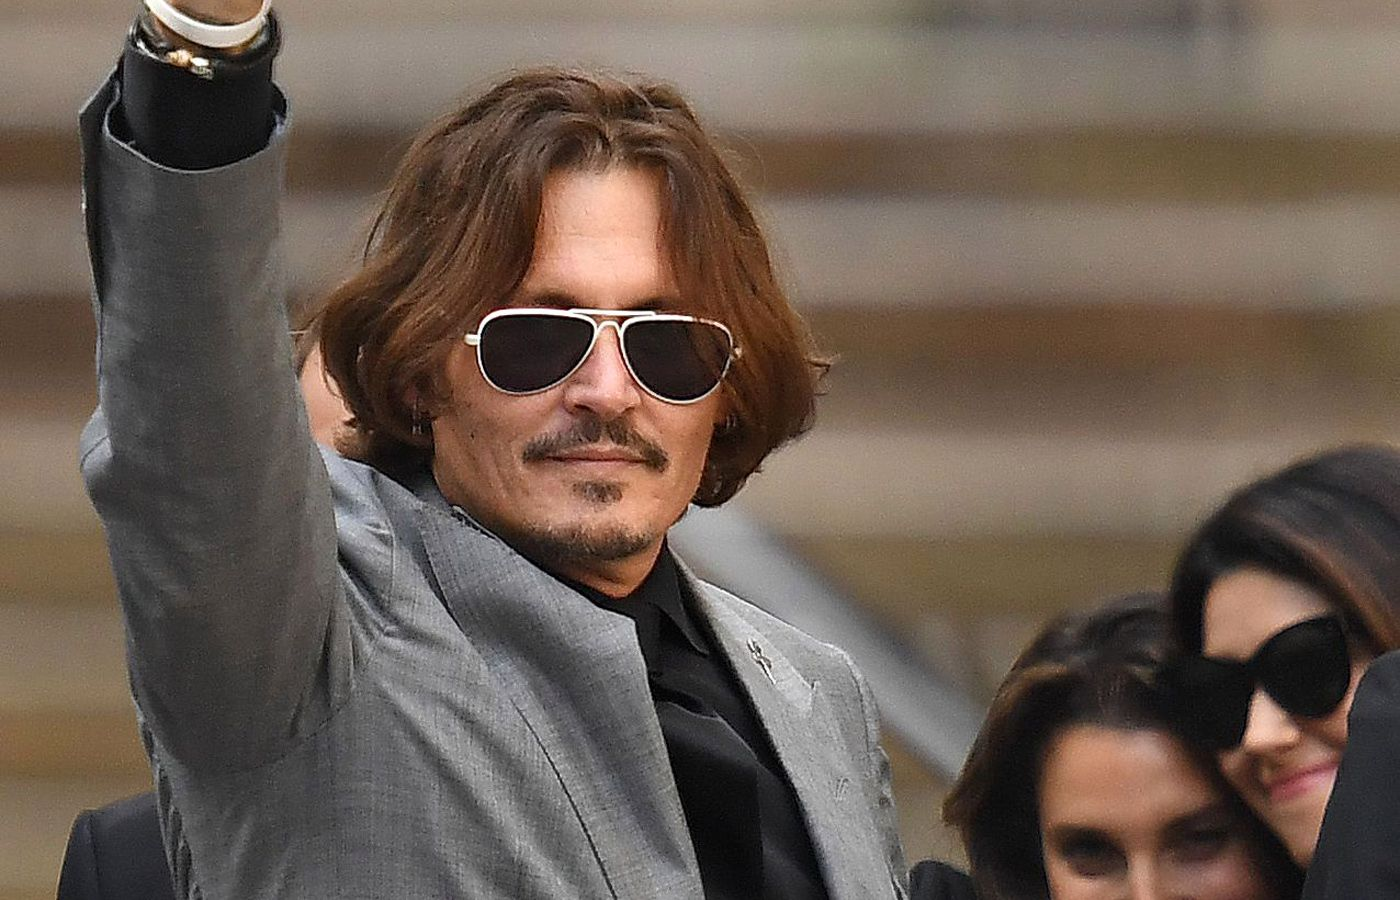 Johnny Depp: Κέρδισε την πρώτη μάχη – Η υψωμένη γροθιά και οι ευχαριστίες στους θαυμαστές του [pics & vid]